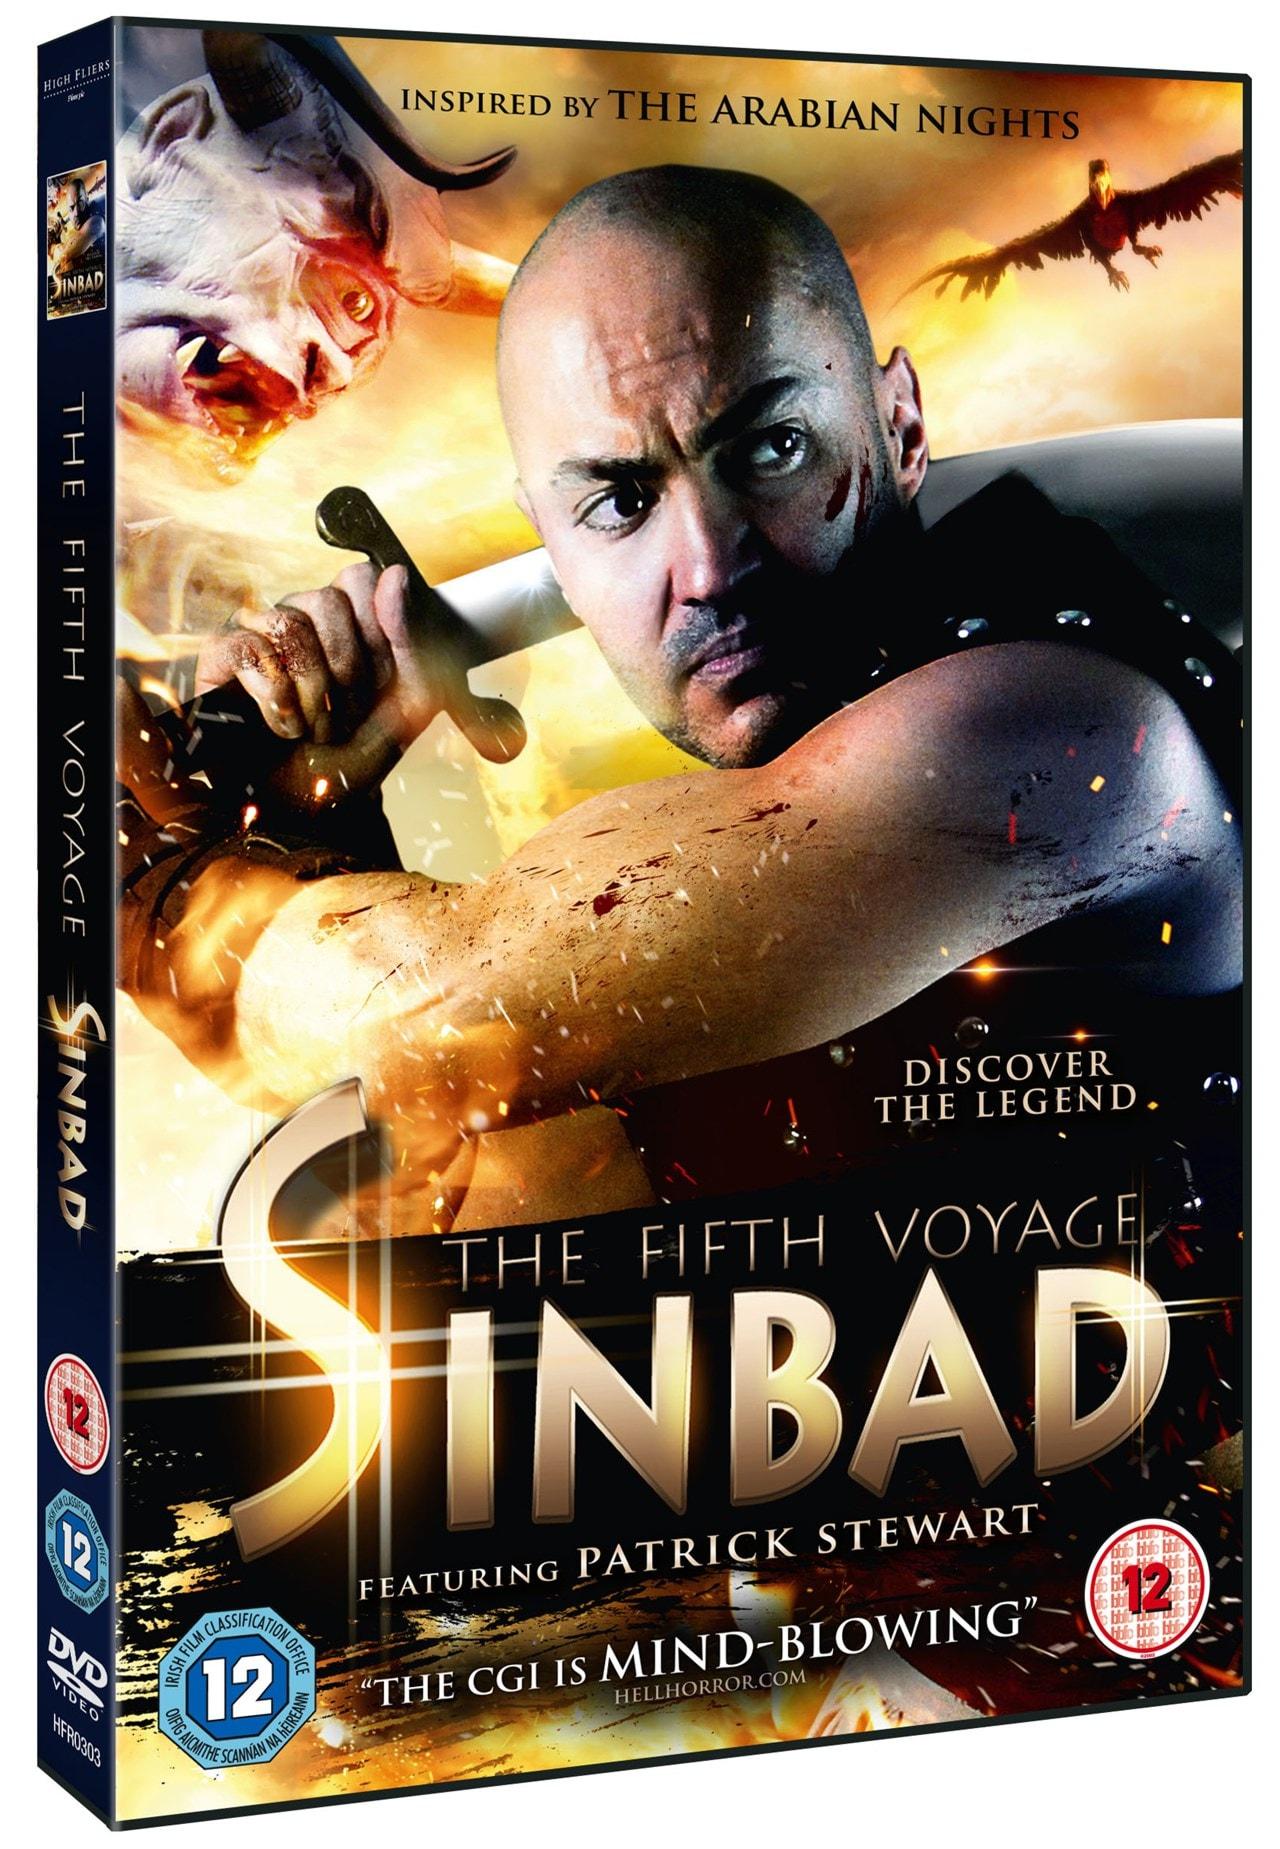 Sinbad - The Fifth Voyage - 2